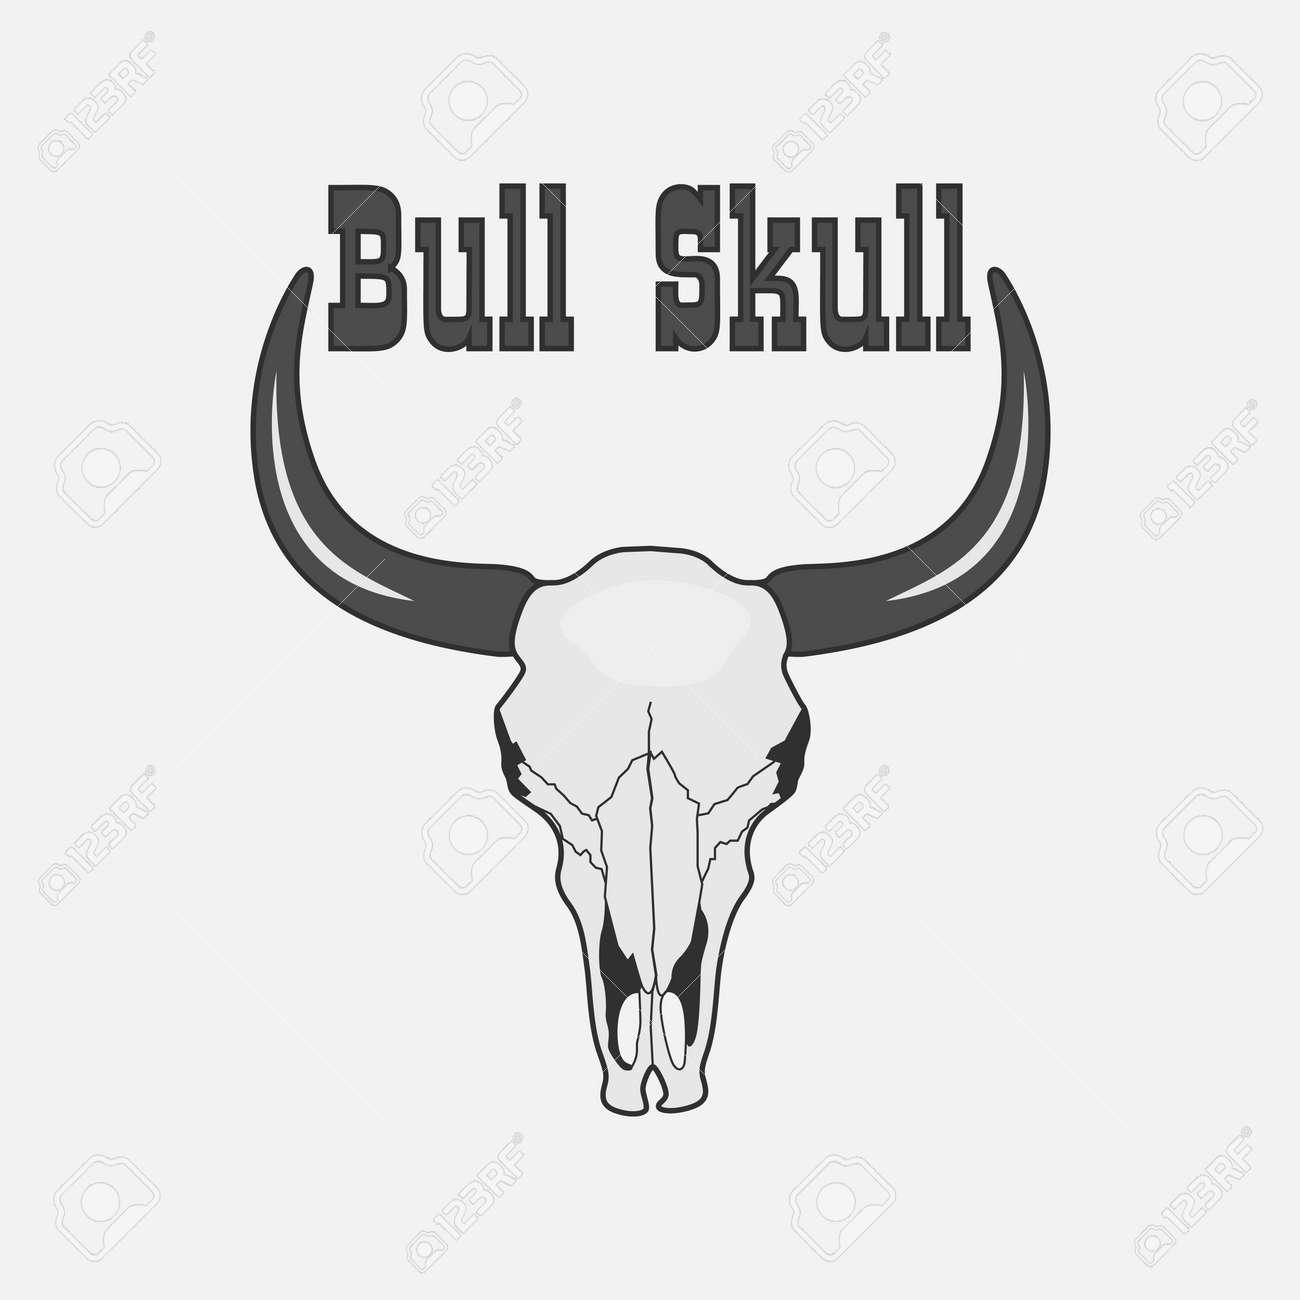 Schwarzweiss-Kuh-Schädel-Design-Element. Skeleton Bull-Kopf-Symbol ...